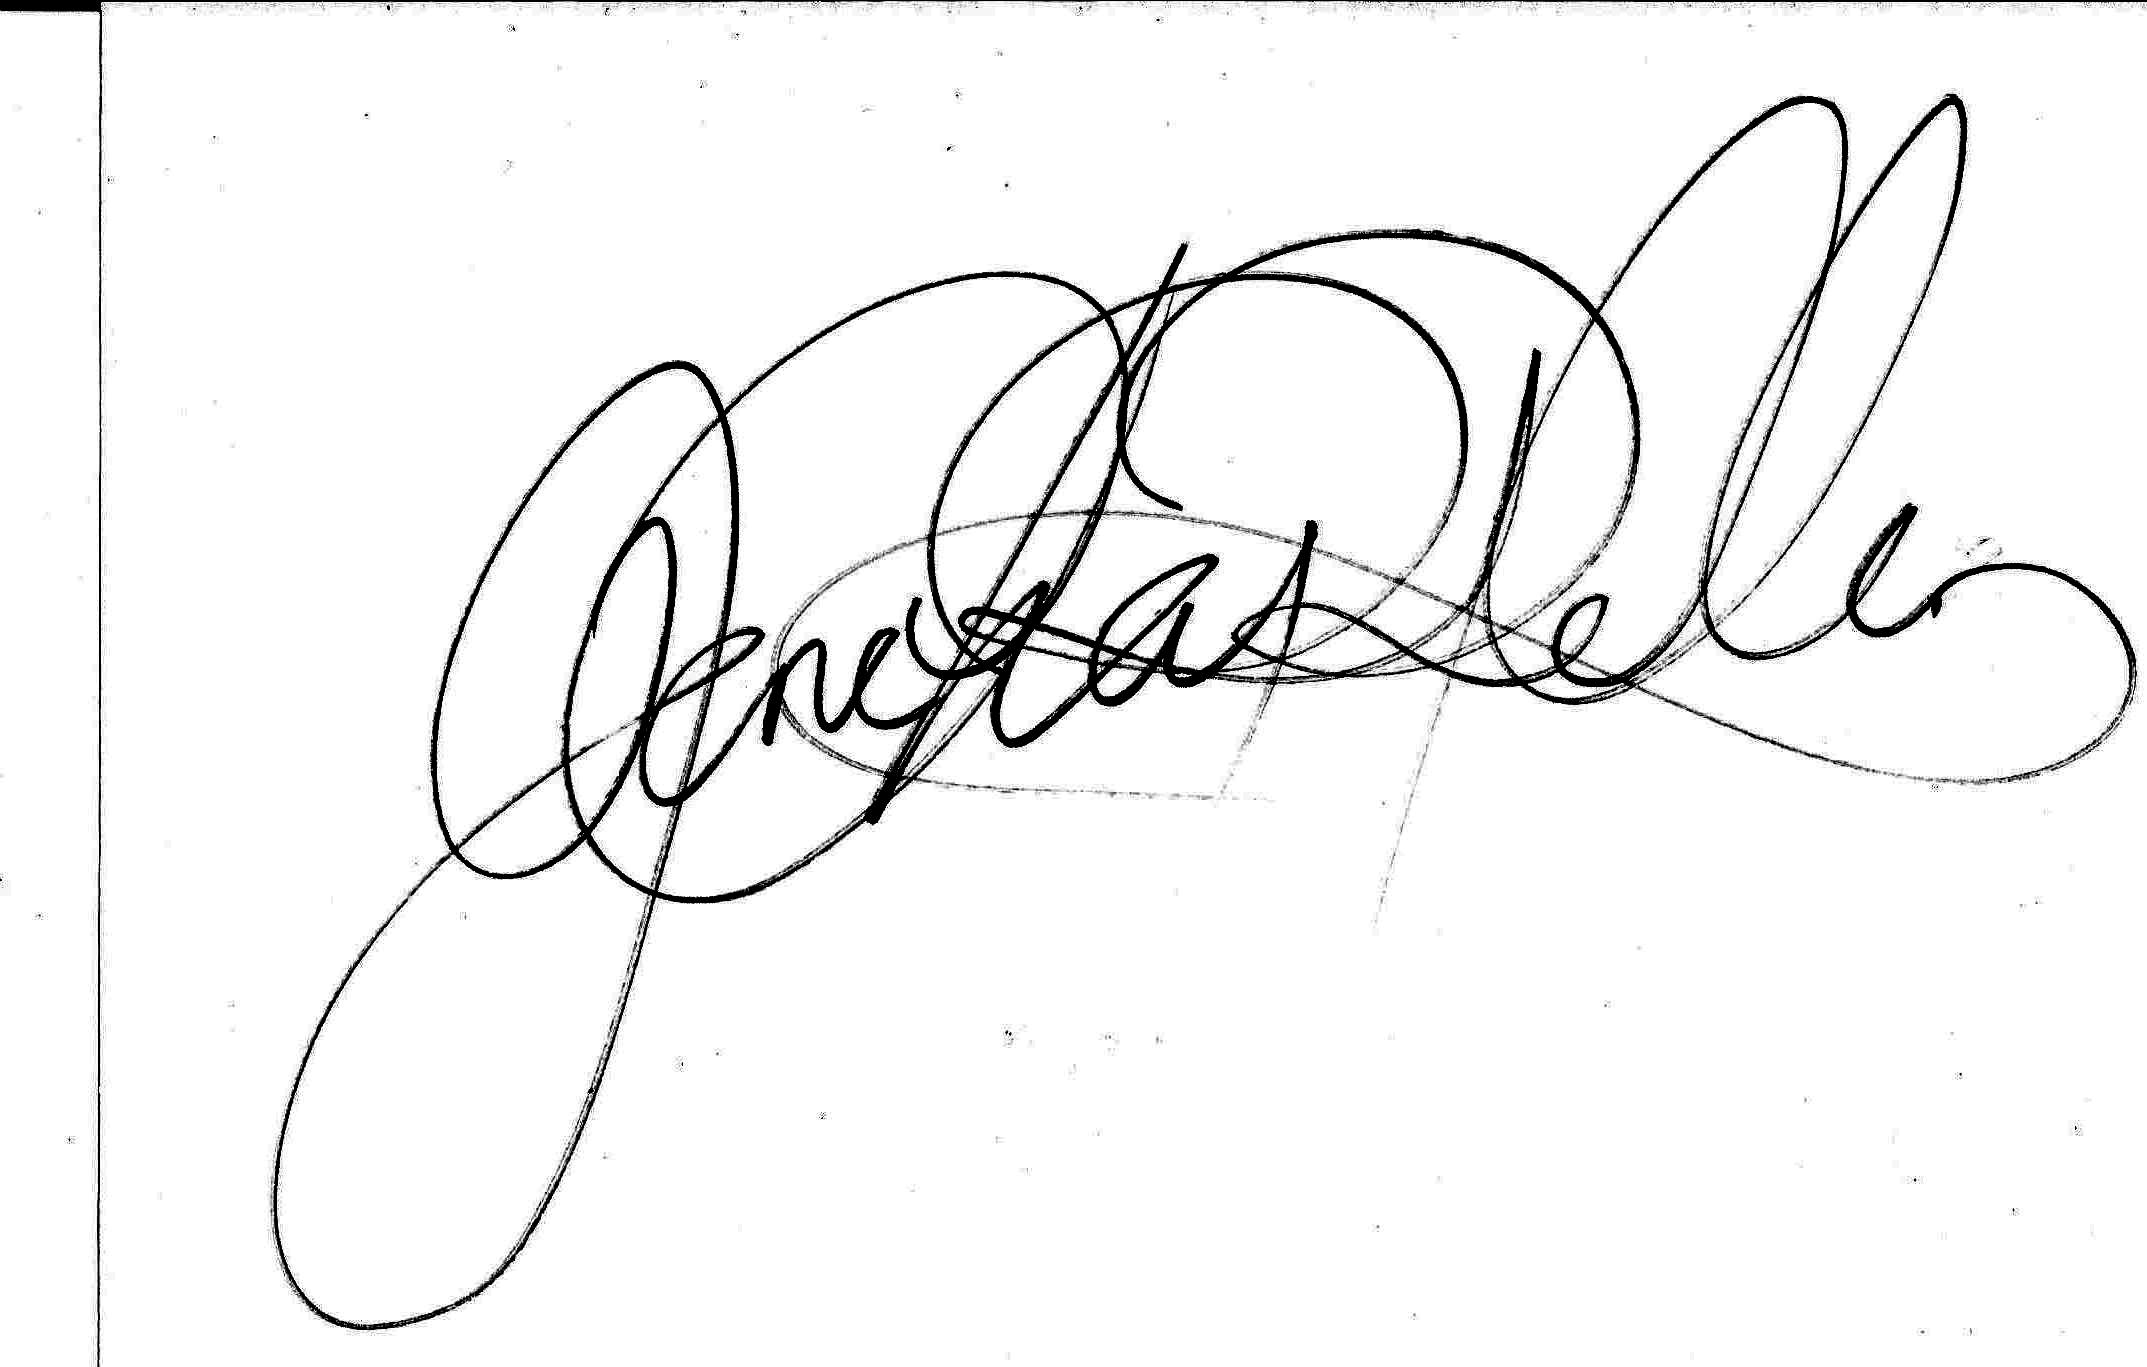 jane chappelle's Signature